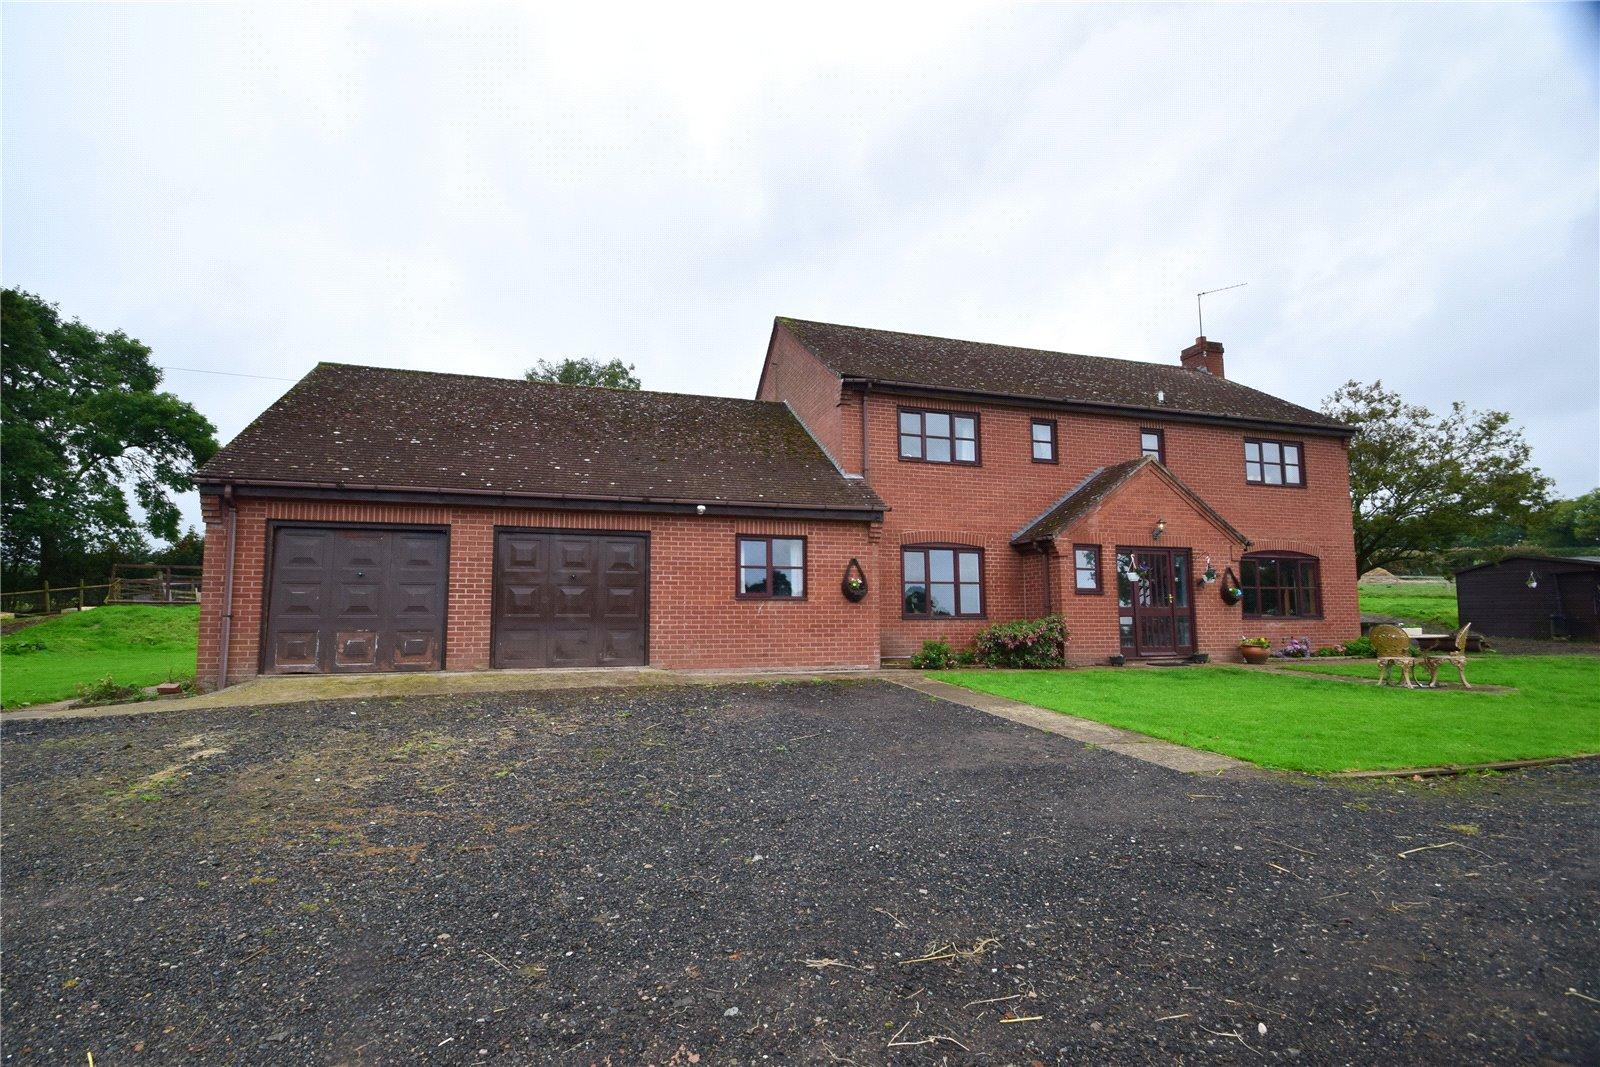 Glebe Farm, Hopton Wafers, Kidderminster, Shropshire, DY14